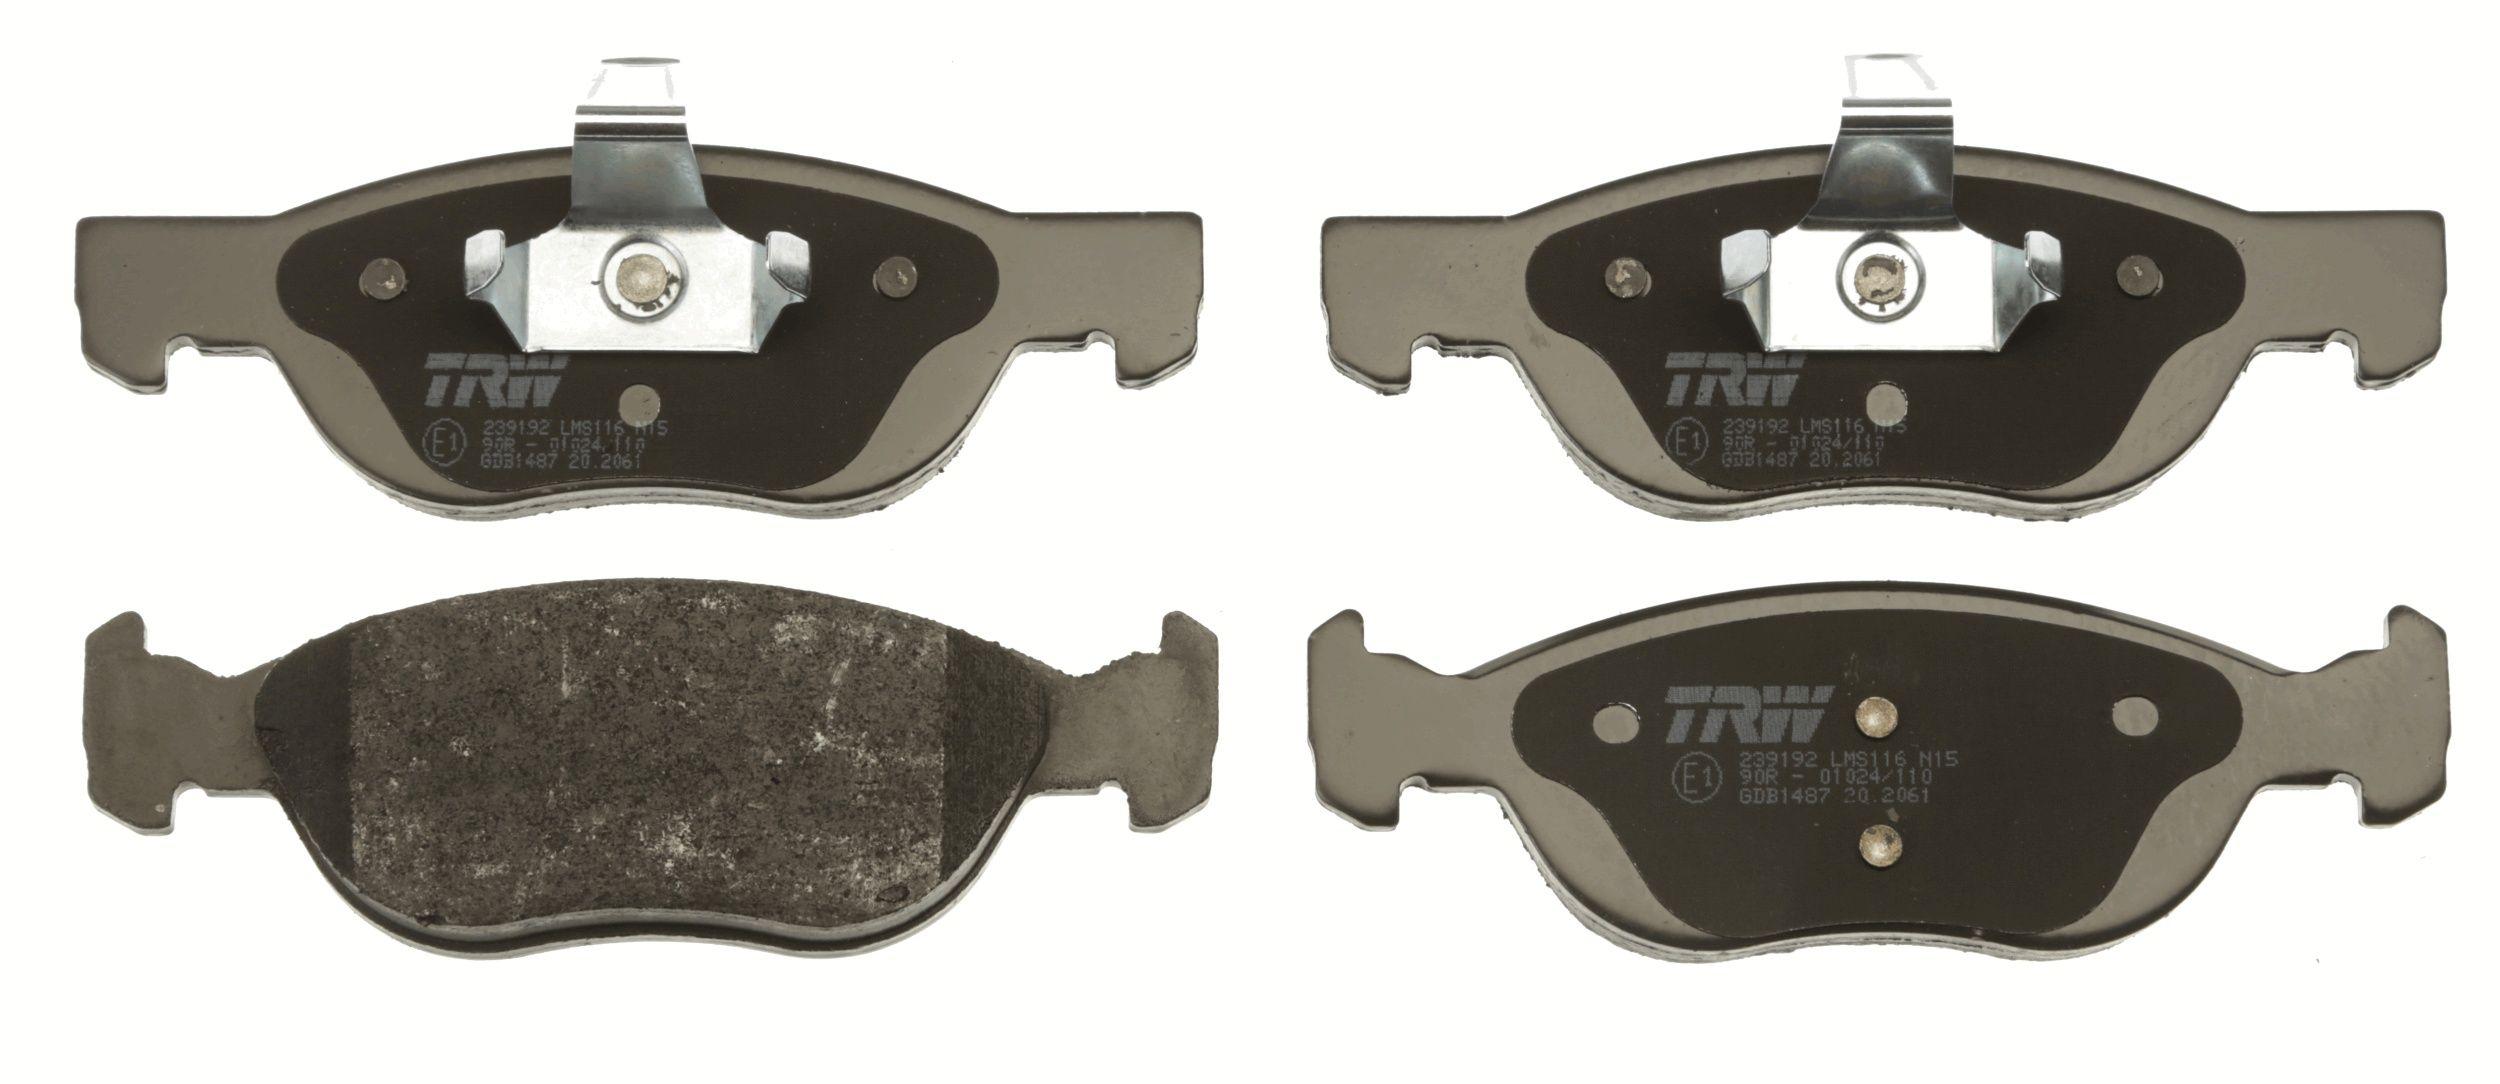 Disk brake pads TRW 21927 rating